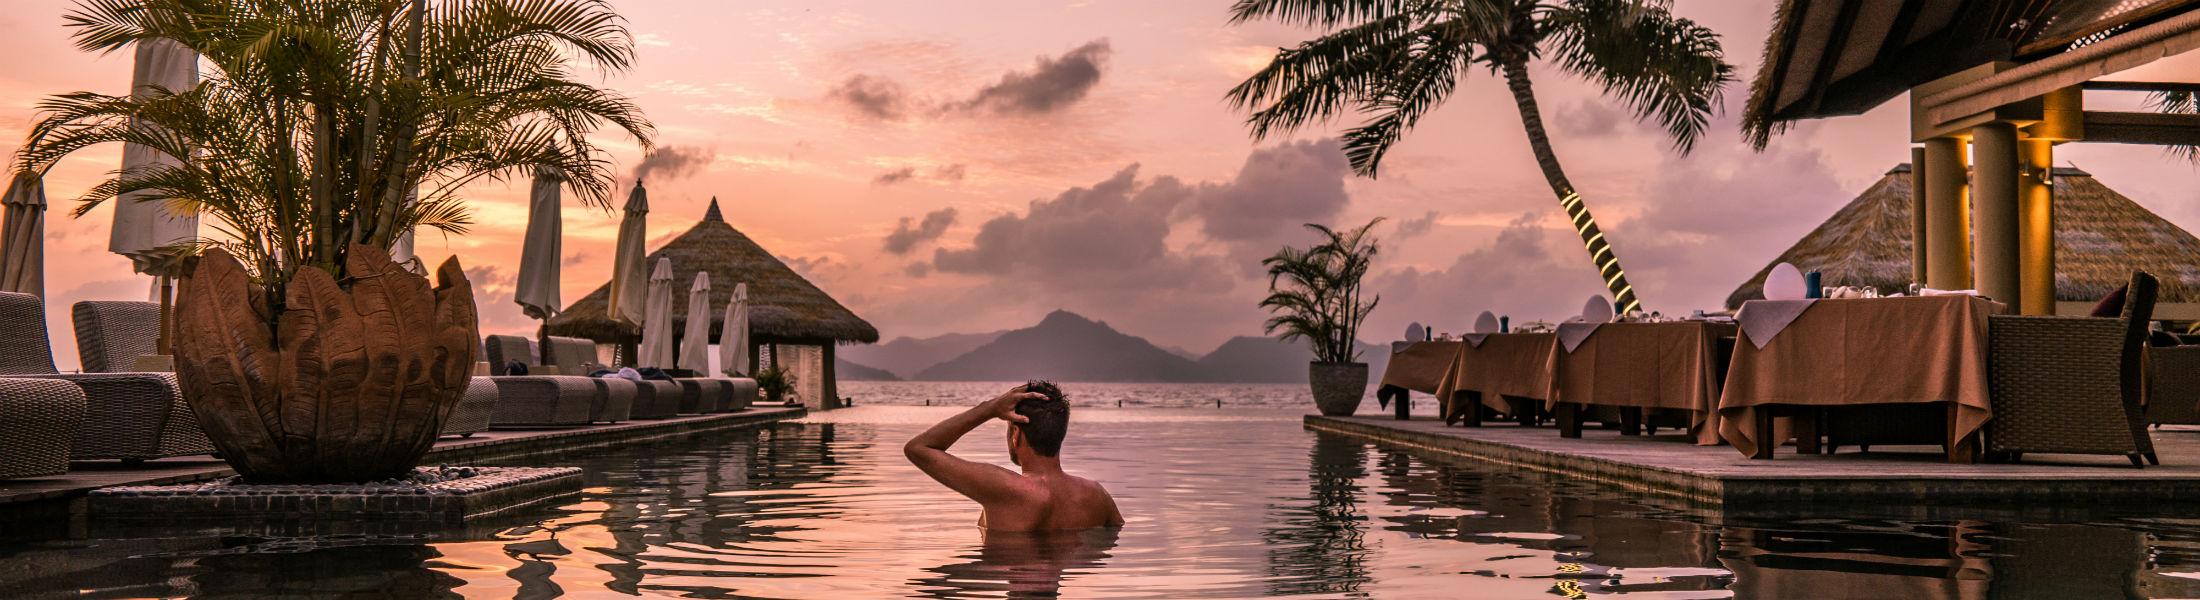 Seychelles islands